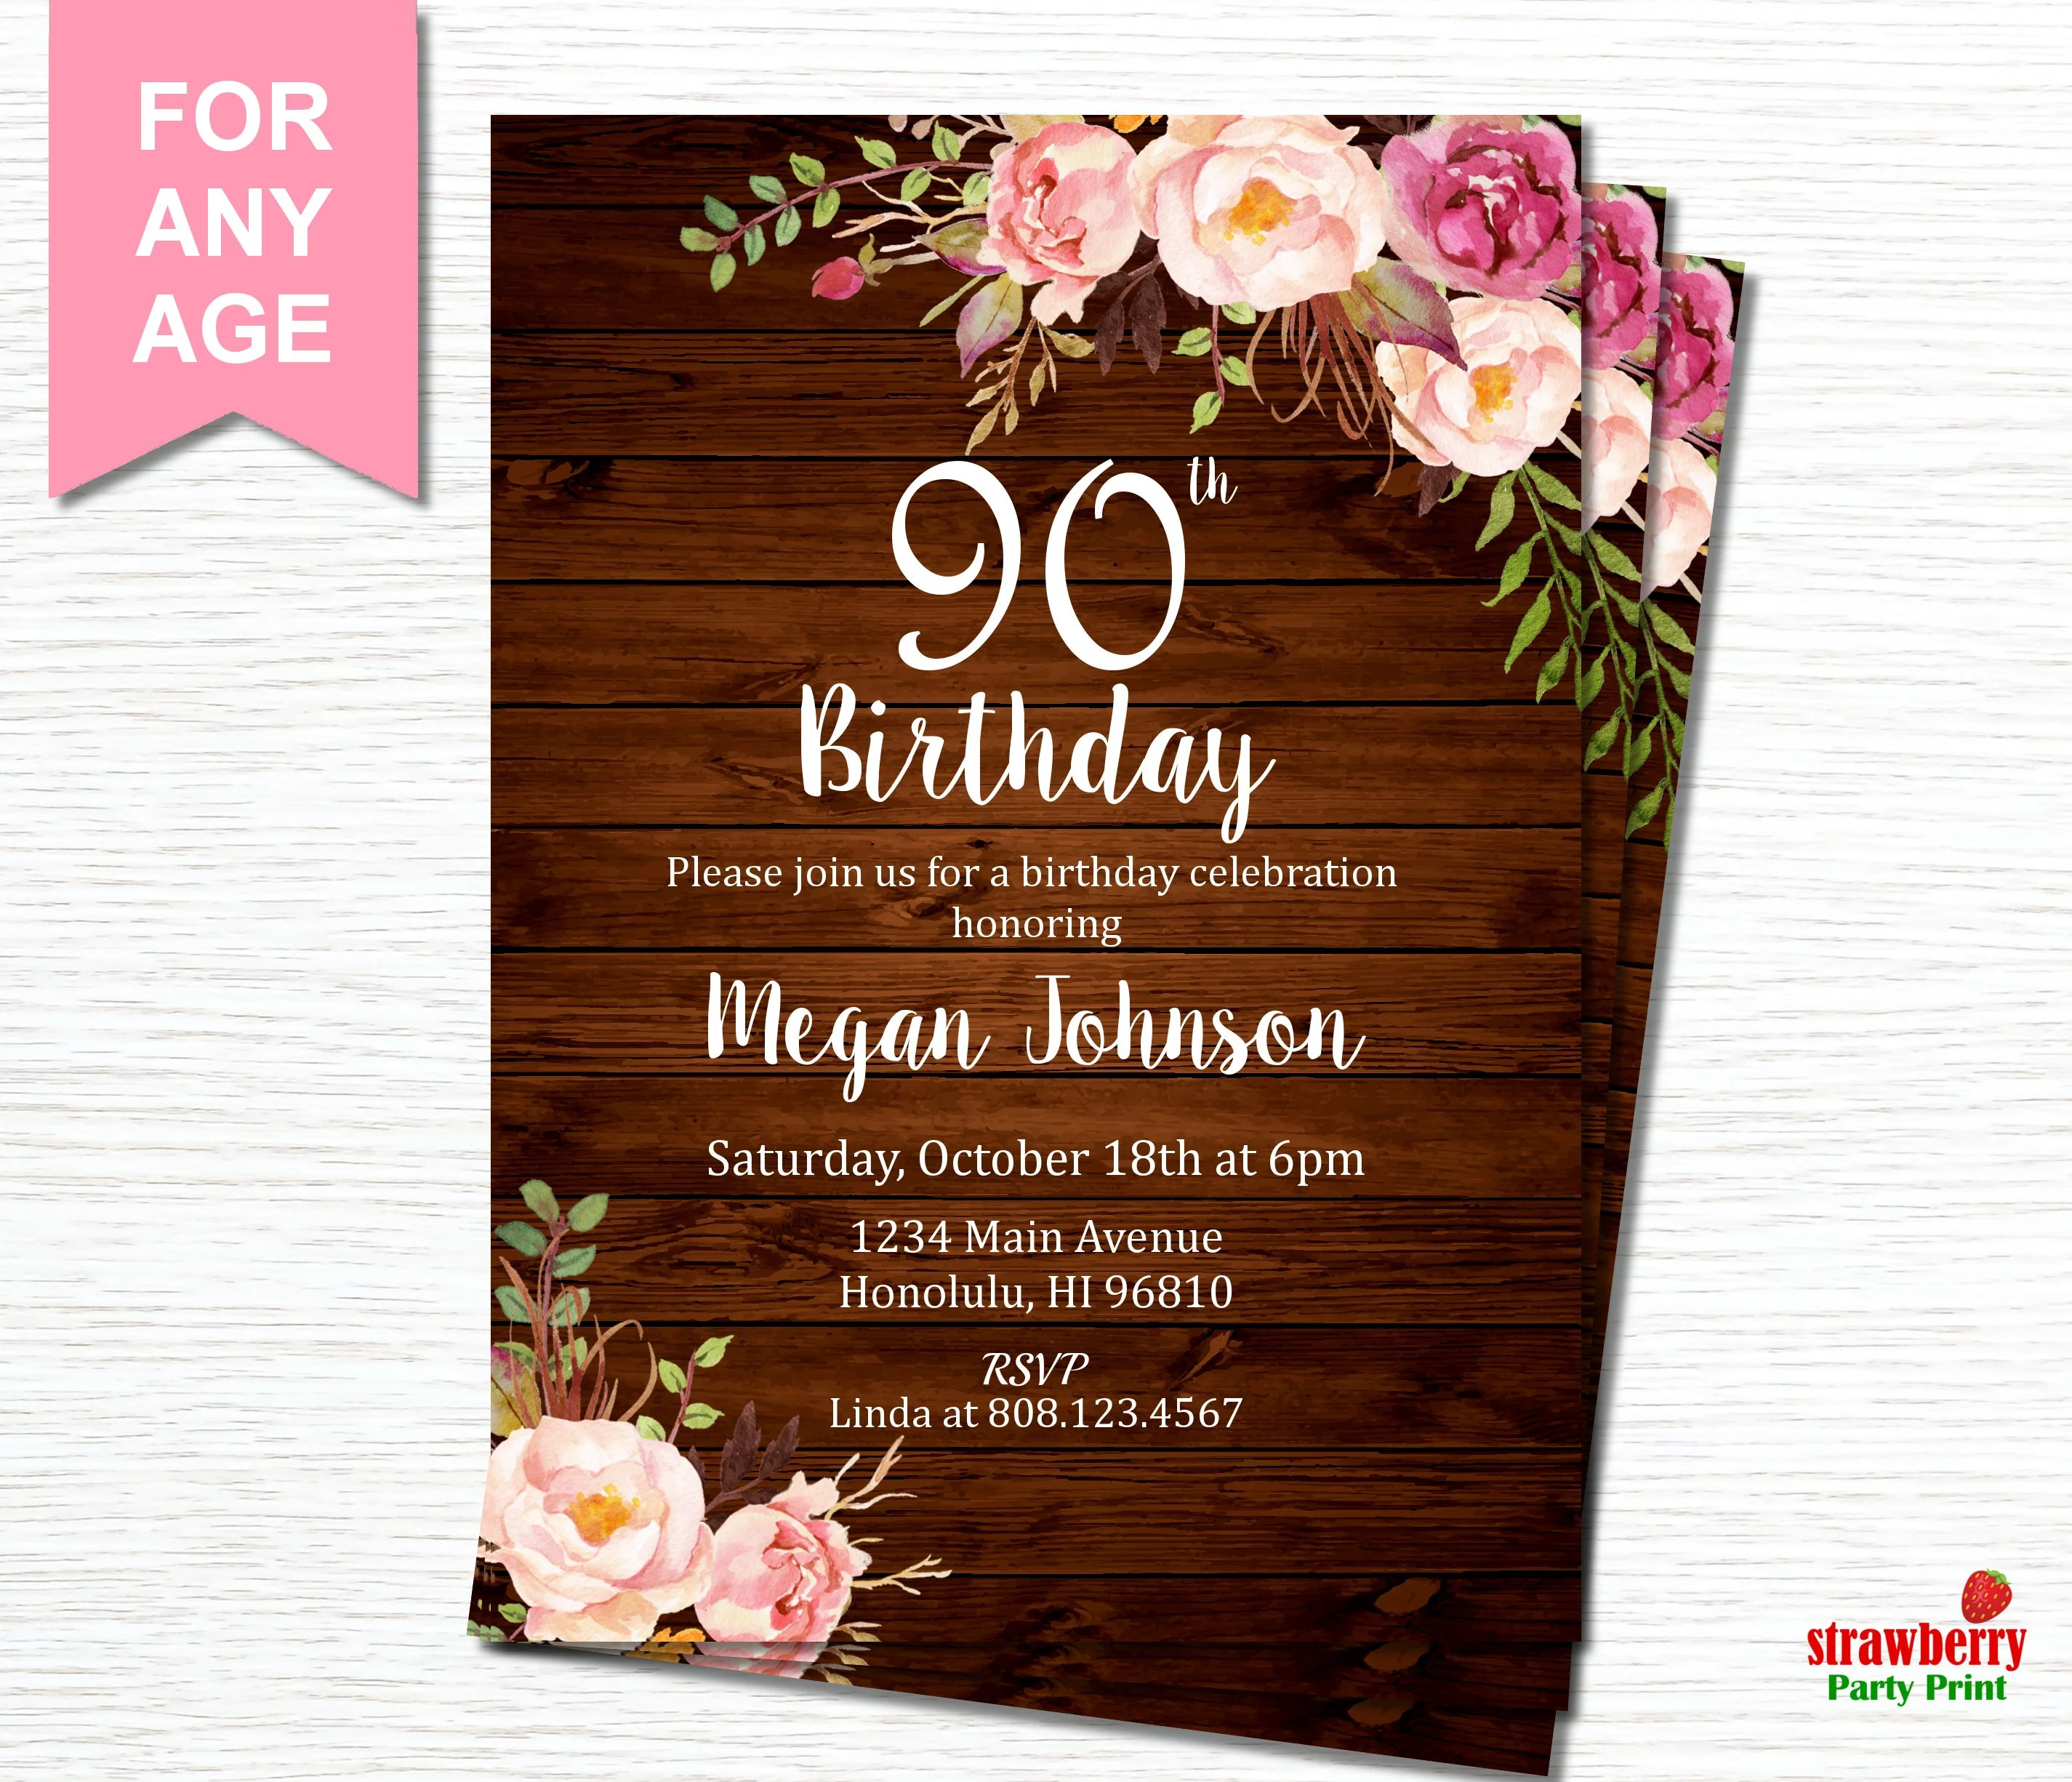 Fullsize Of 90th Birthday Invitations